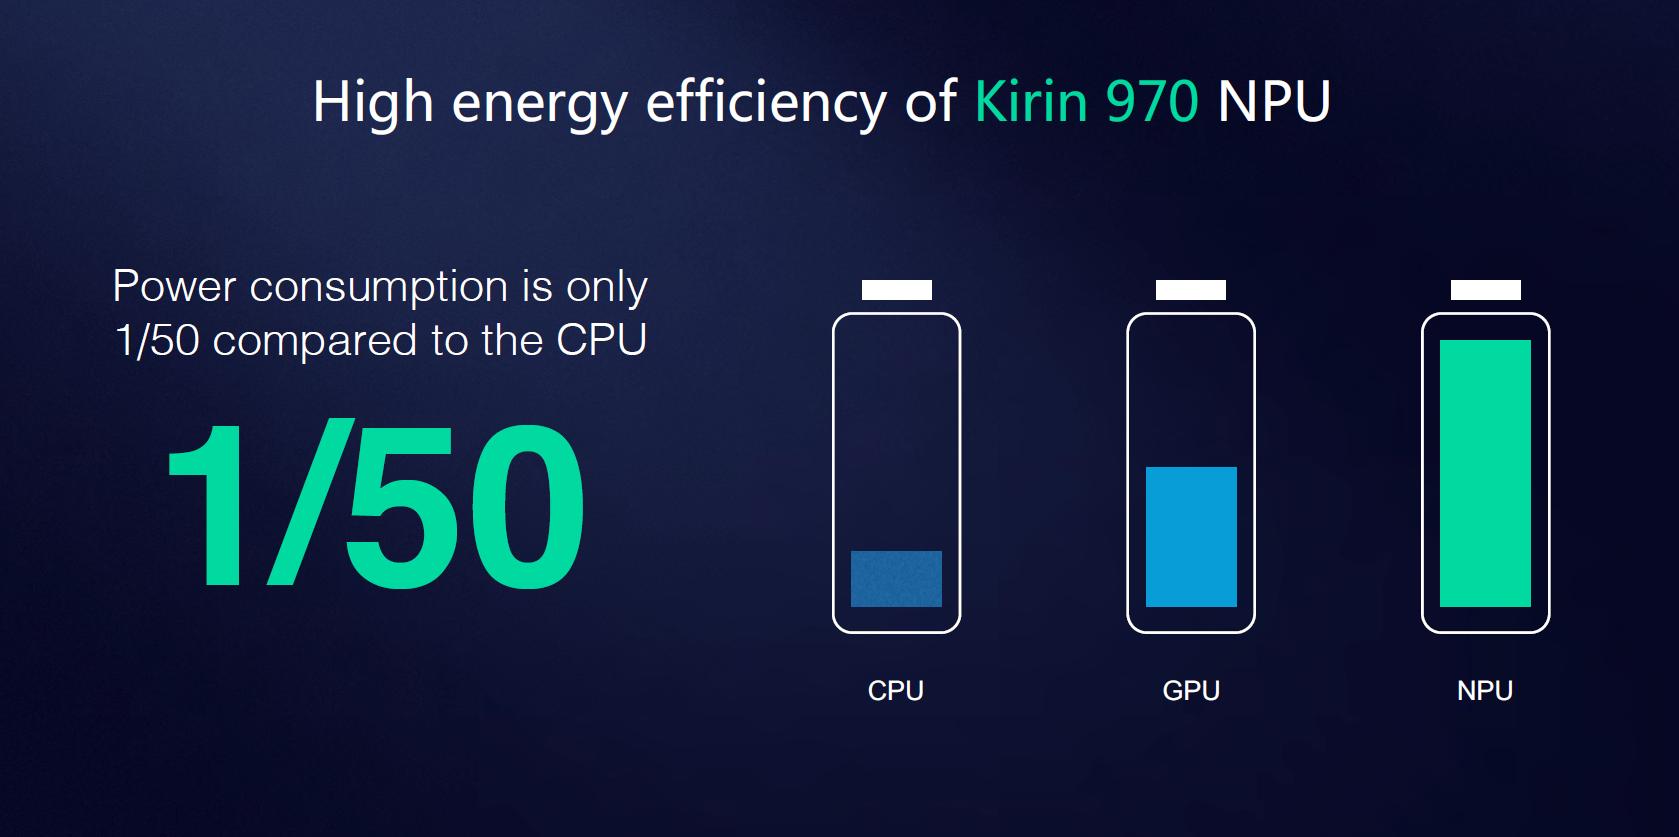 NPU Performance & Huawei's Use-cases - HiSilicon Kirin 970